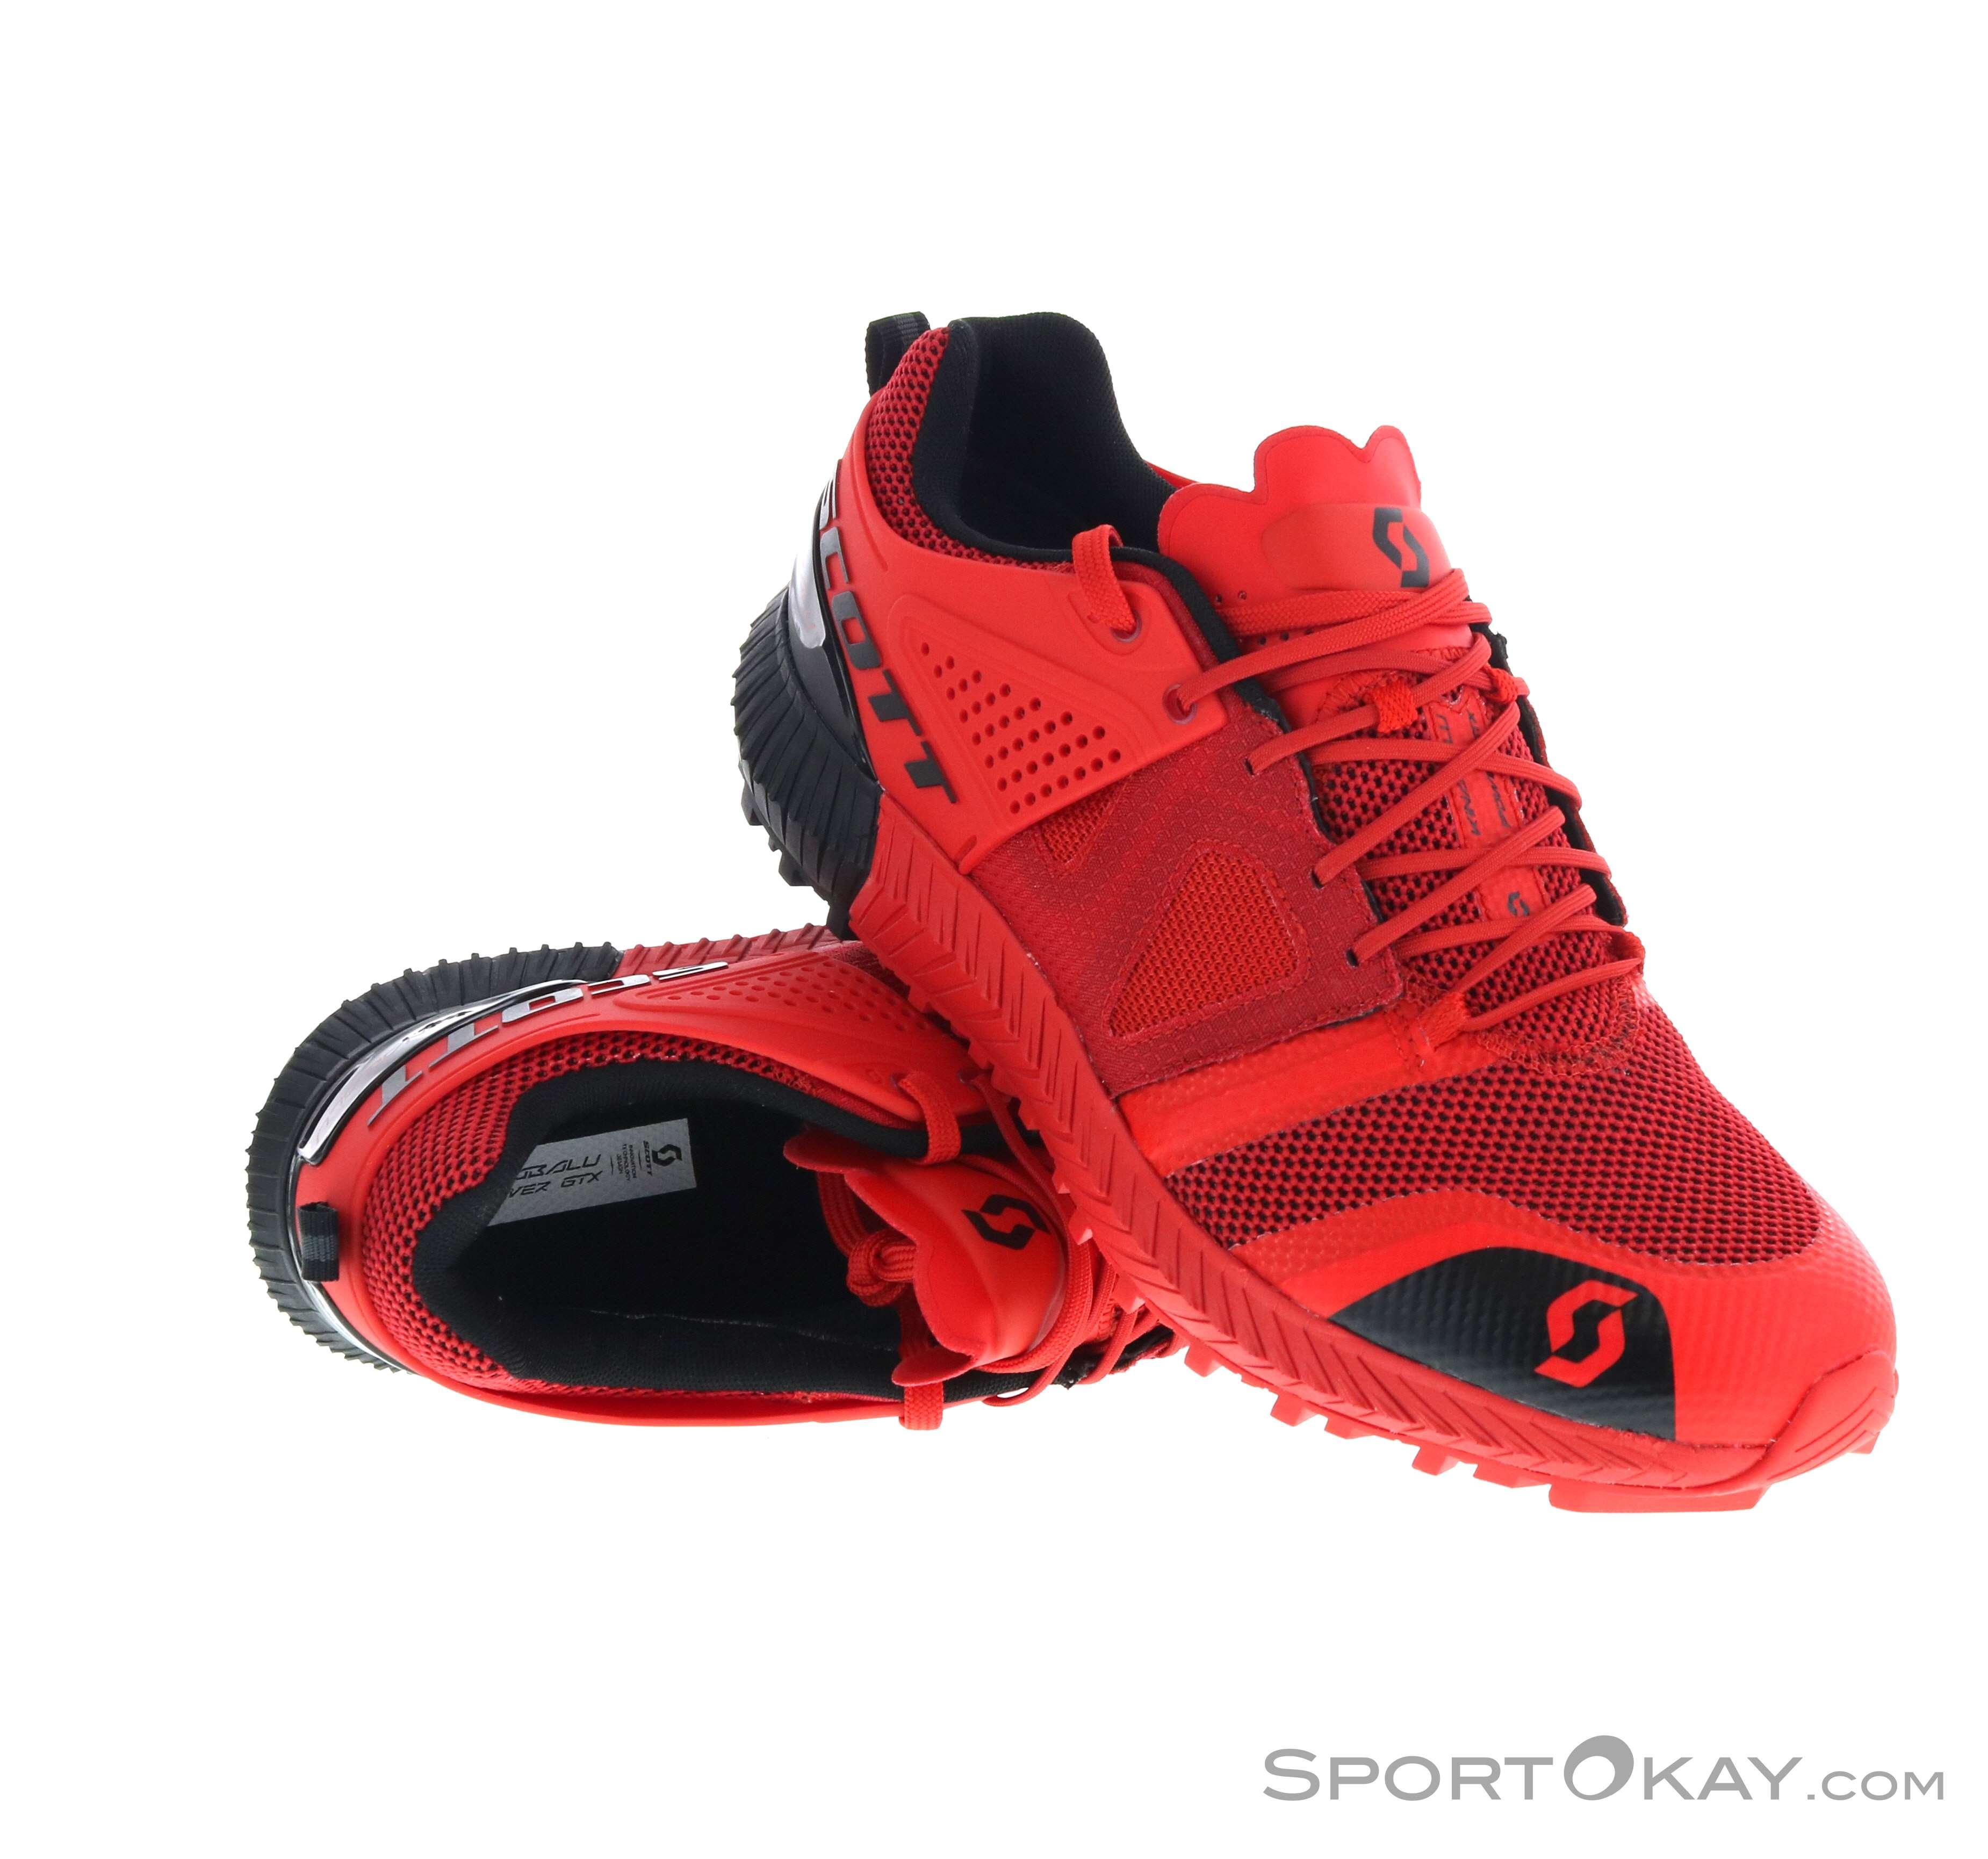 acquista per comprare nuovo immagini dettagliate Scott Scott Kinabalu Power GTX Uomo Scarpe Trail Running Gore-Tex